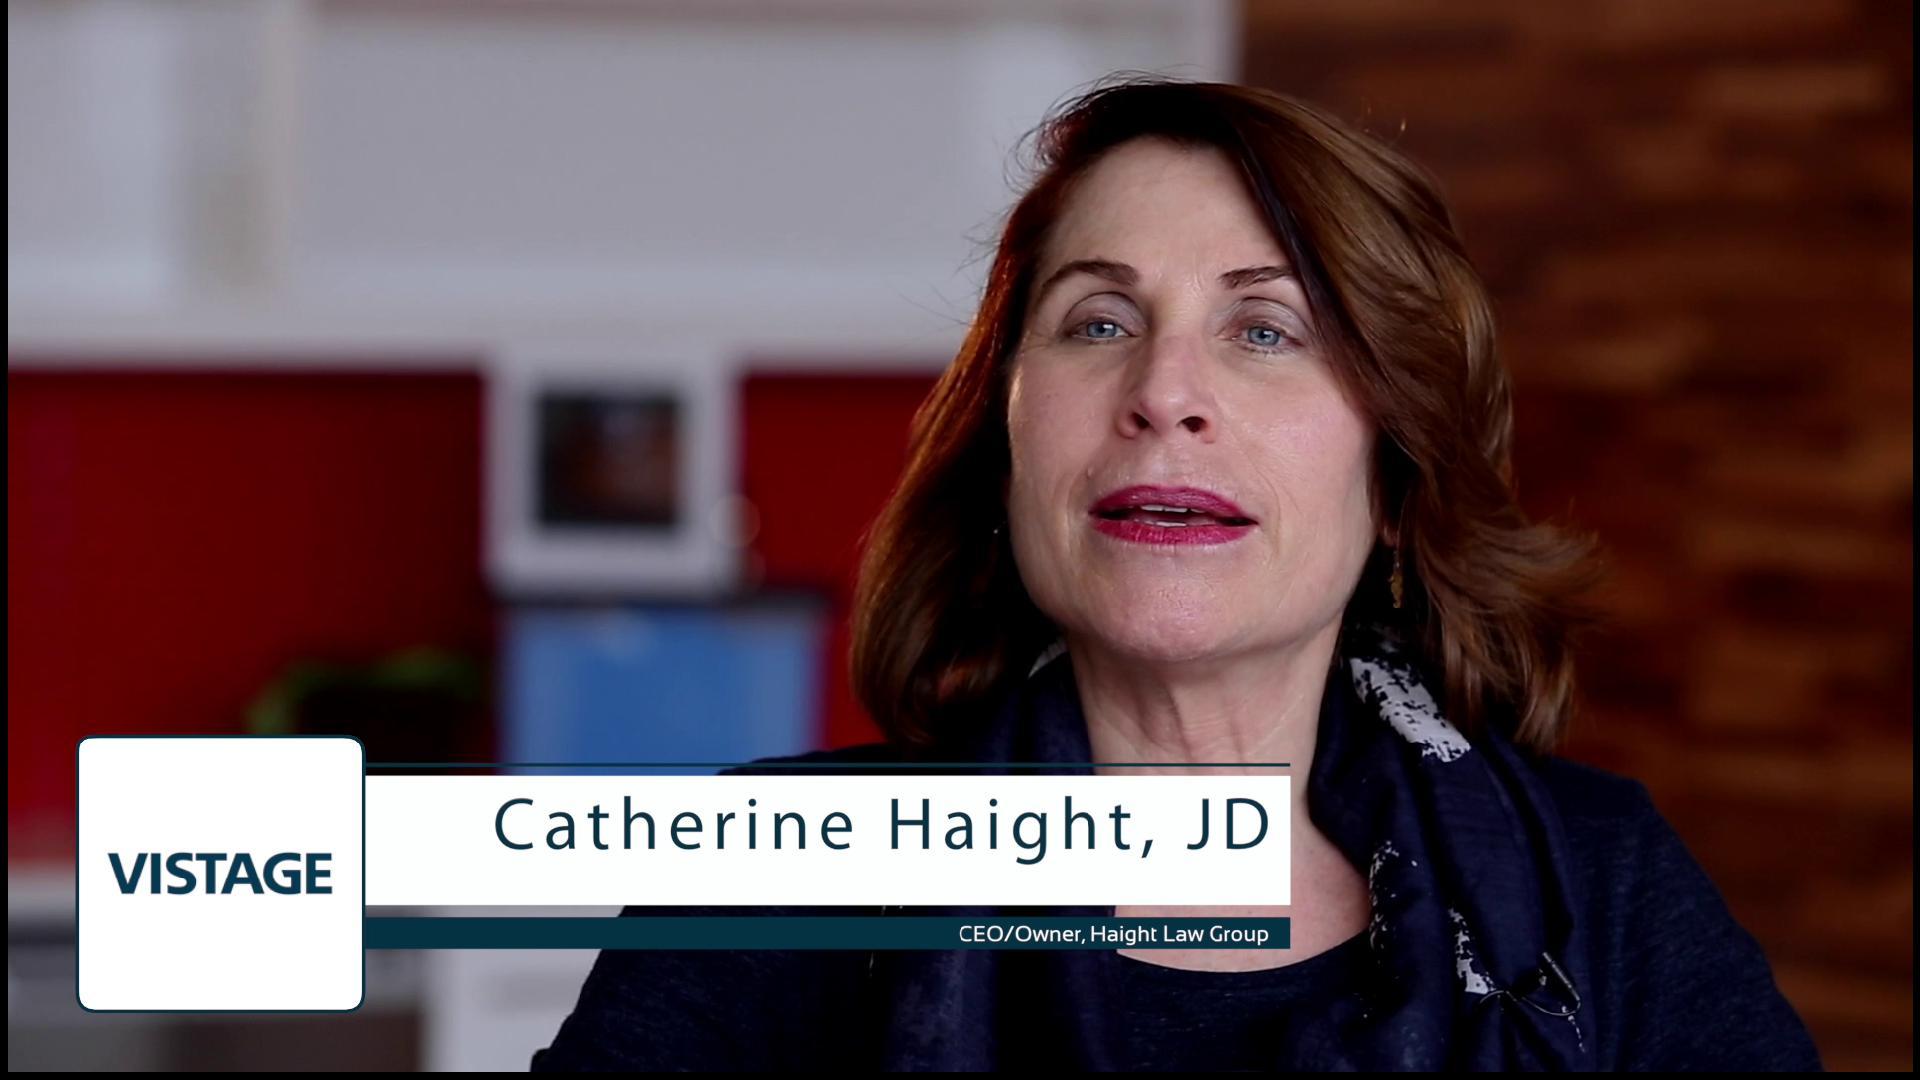 Cathy Haight